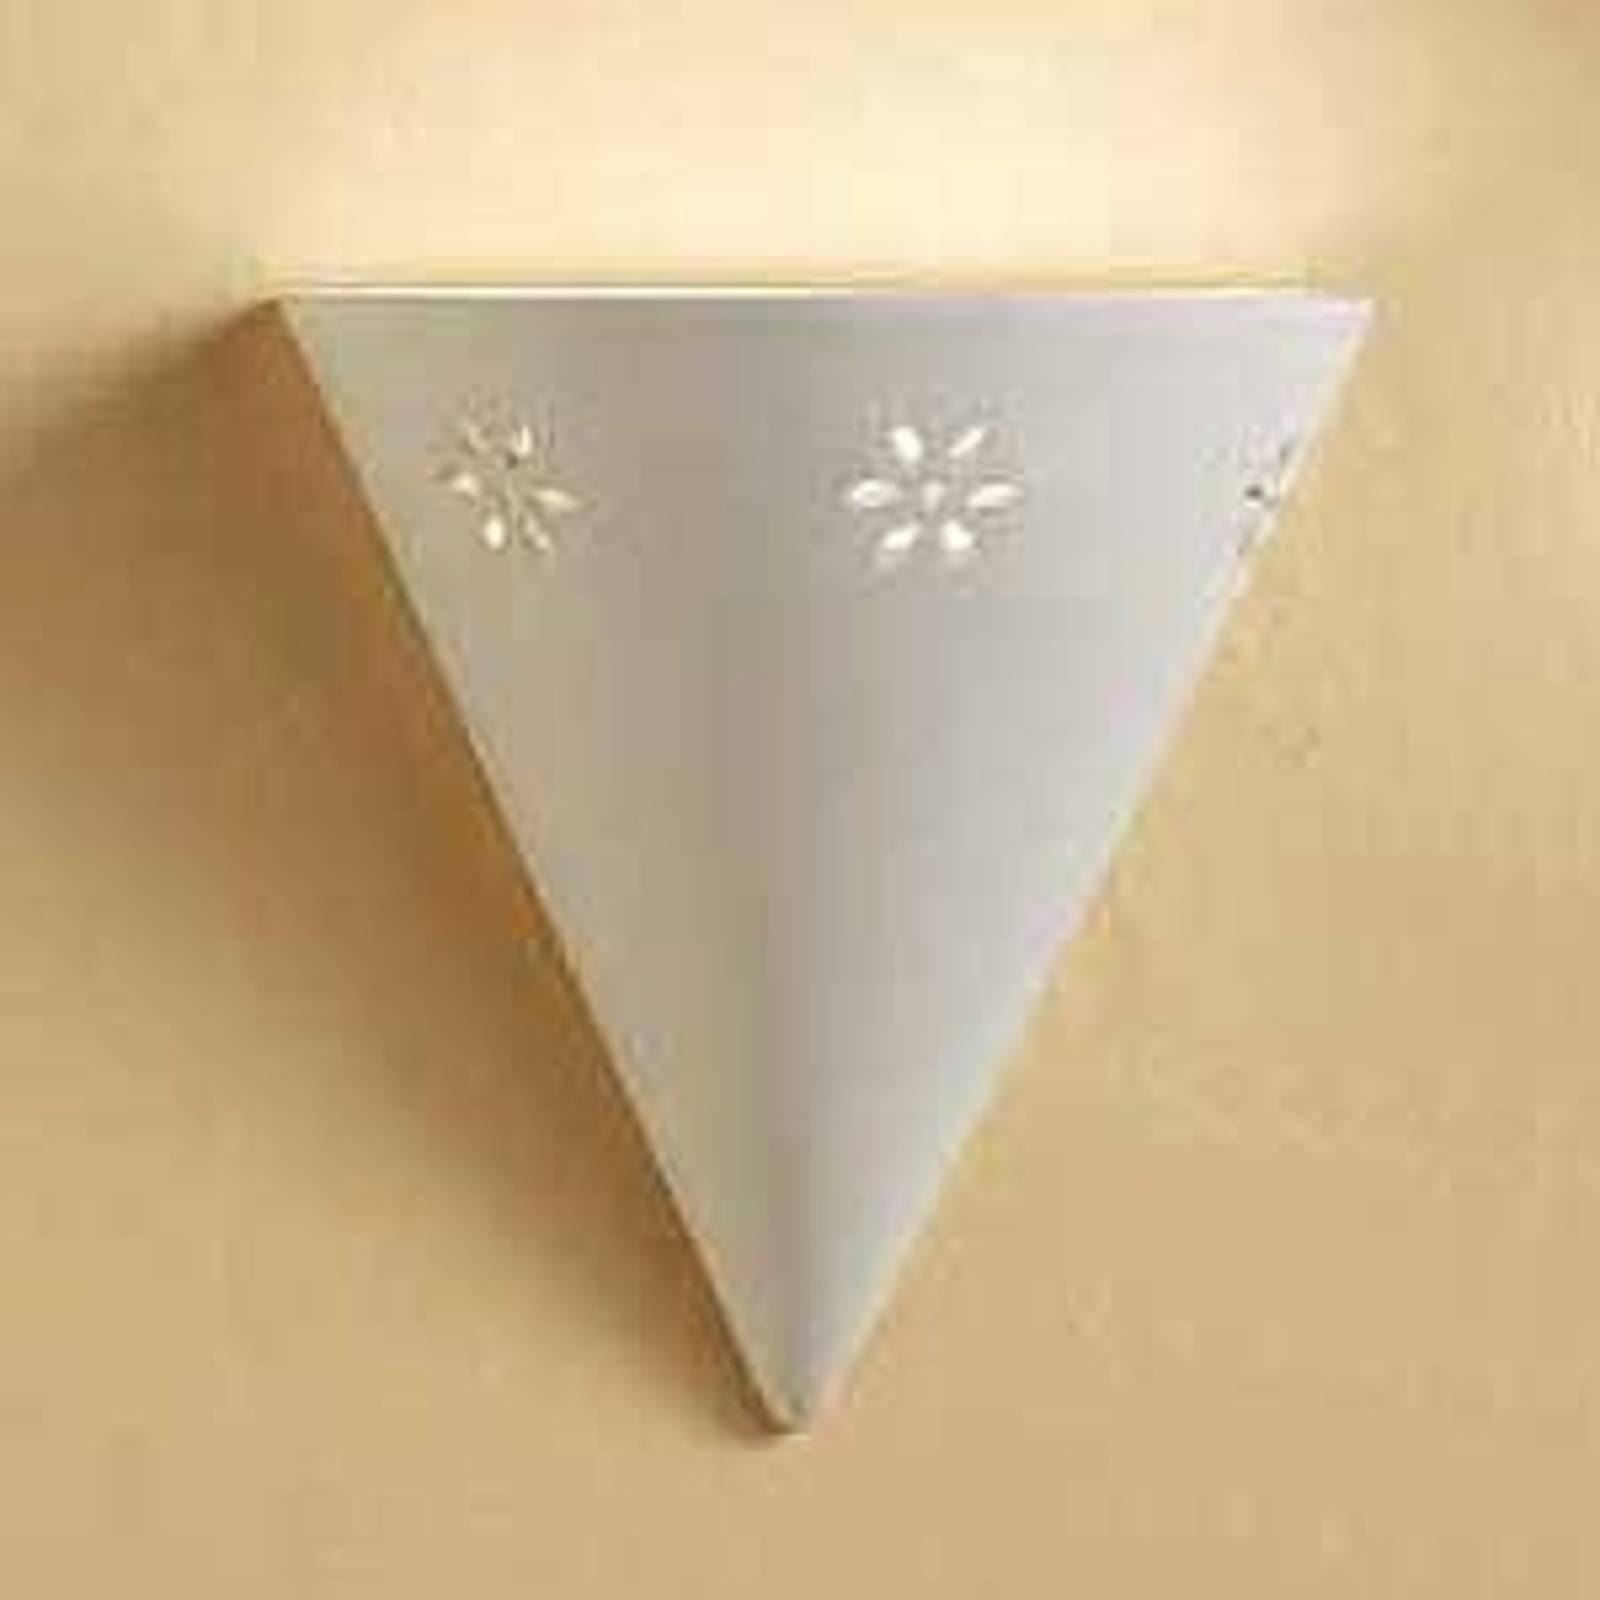 Edle Wandleuchte Cono aus weißer Keramik